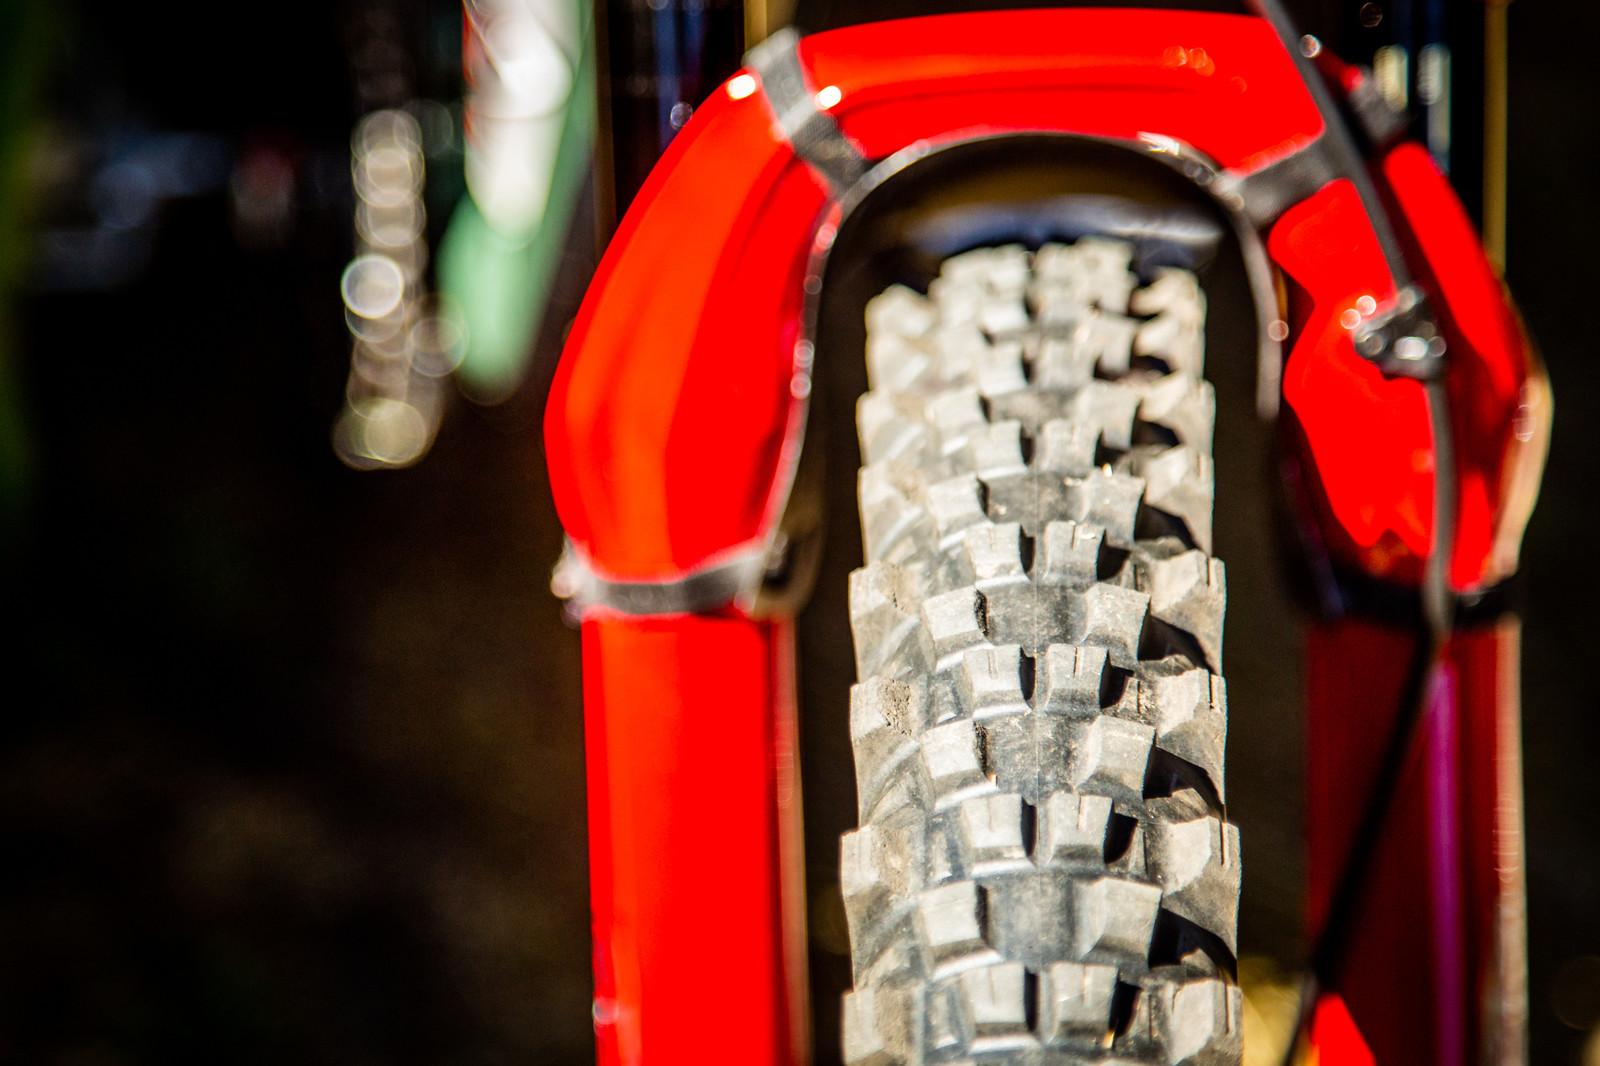 Michelin Wild Enduro Tires - PIT BITS - Enduro World Series, La Thuile - Mountain Biking Pictures - Vital MTB